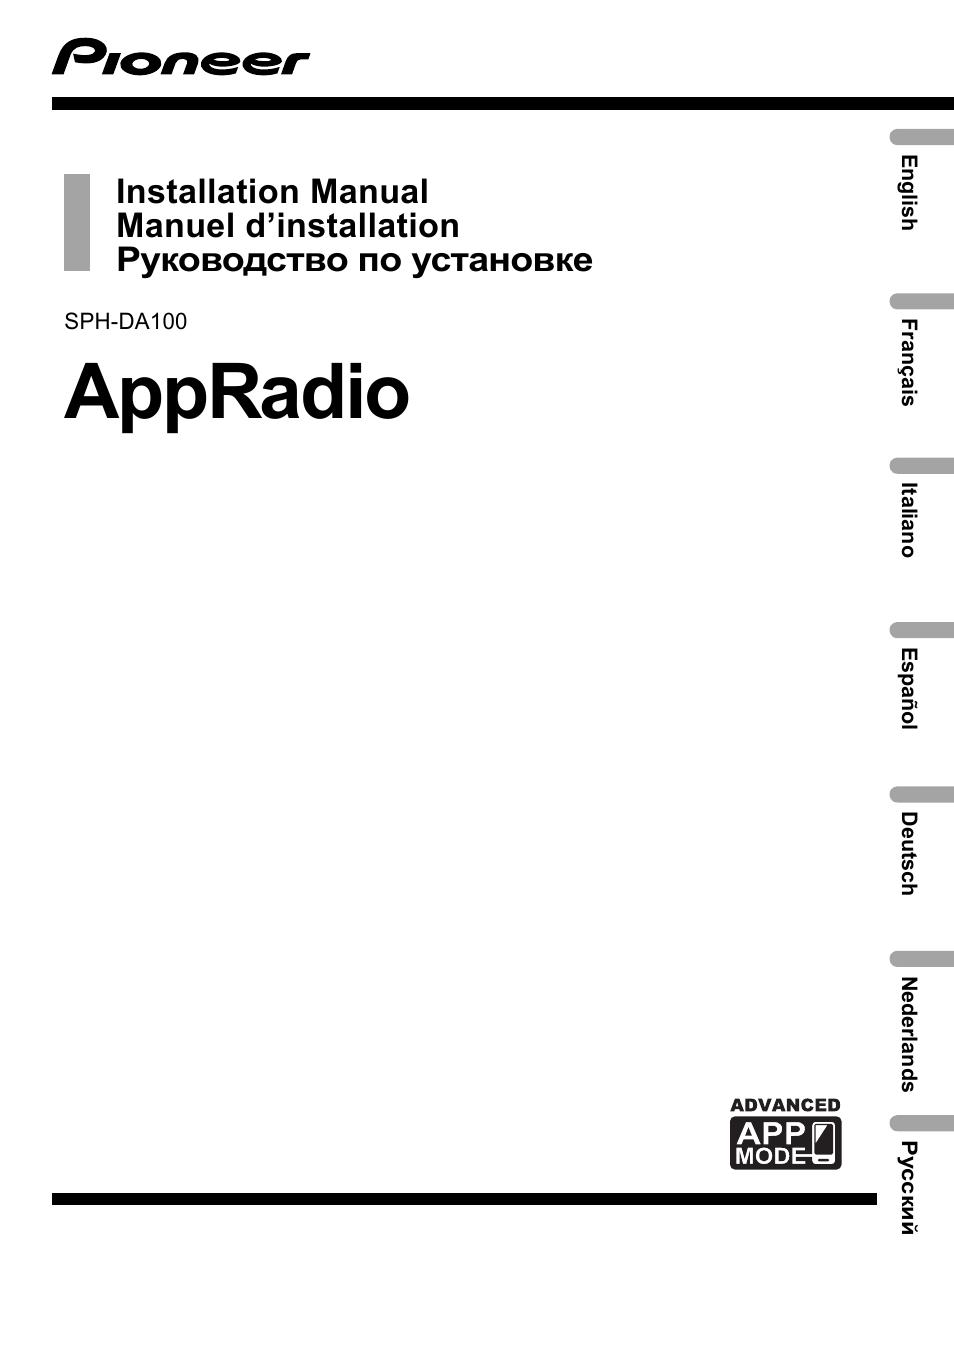 pioneer sph da100 user manual 144 pages rh manualsdir com Pioneer AppRadio 2 iPhone 5 Pioneer AppRadio 2 Rear